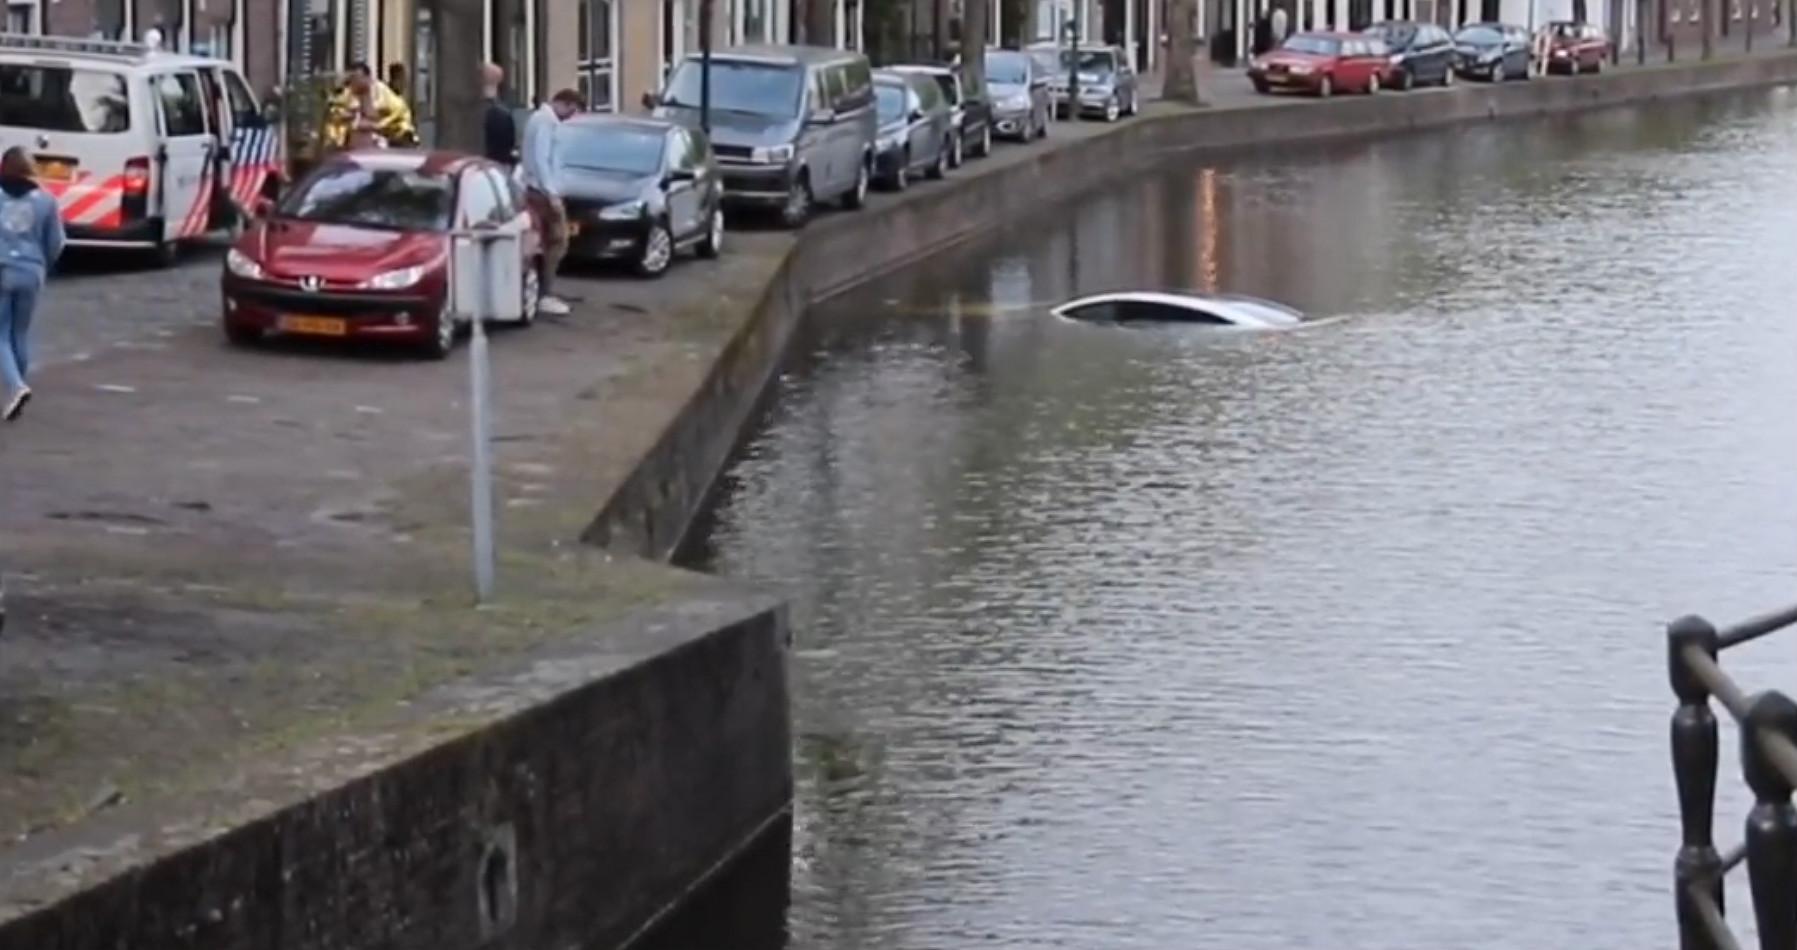 Model X sinks dutch canal 6 [Credit: Flashphoto NL/YouTube]